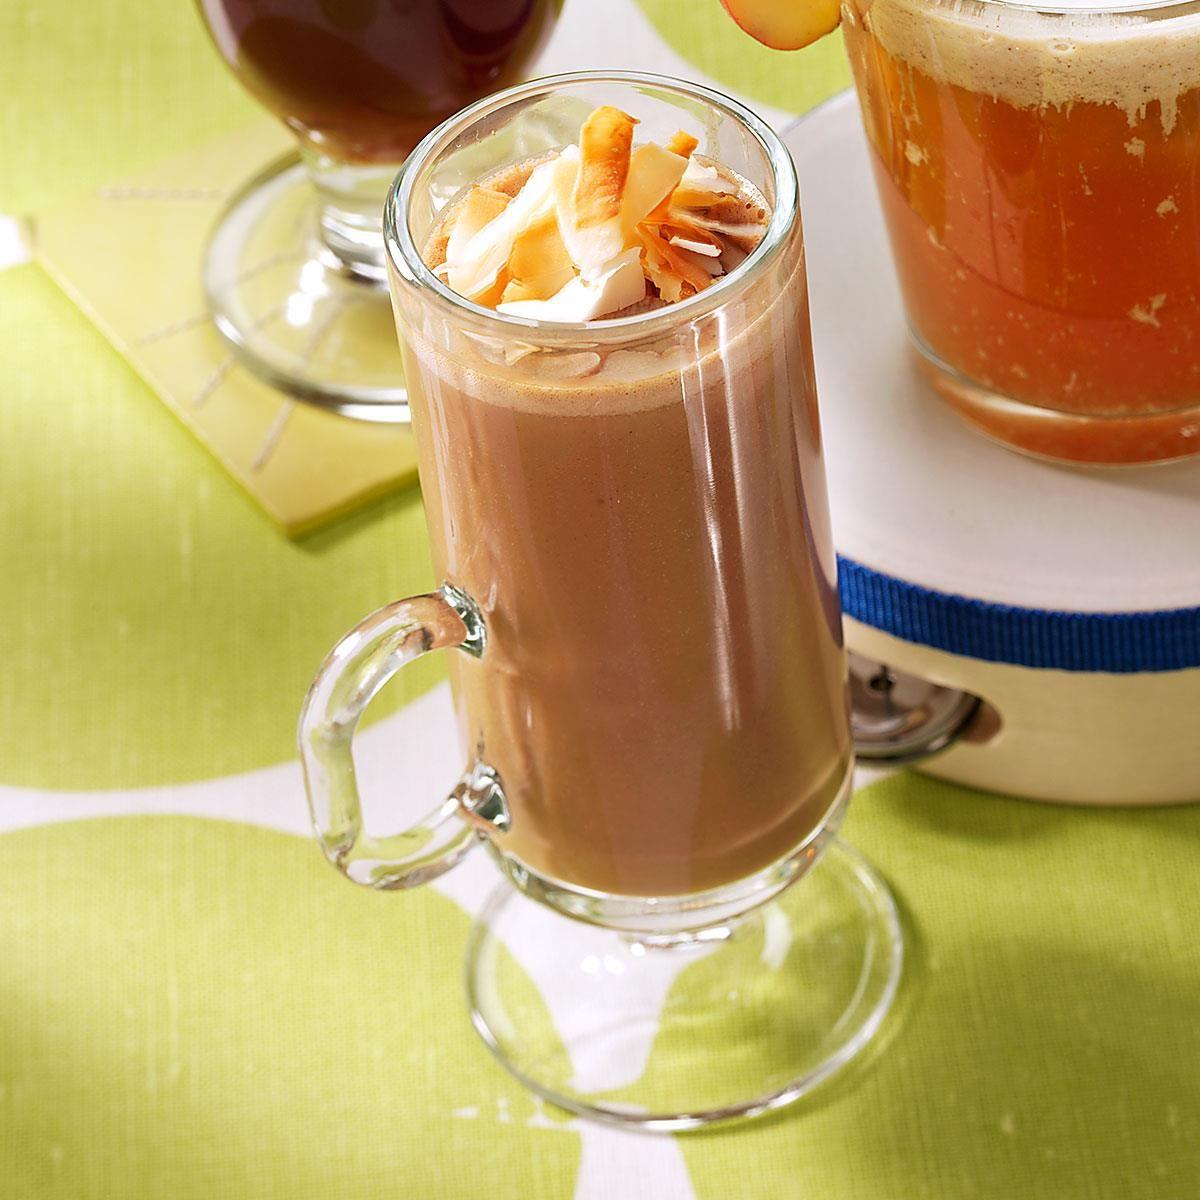 Coconut-Caramel Hot Cocoa